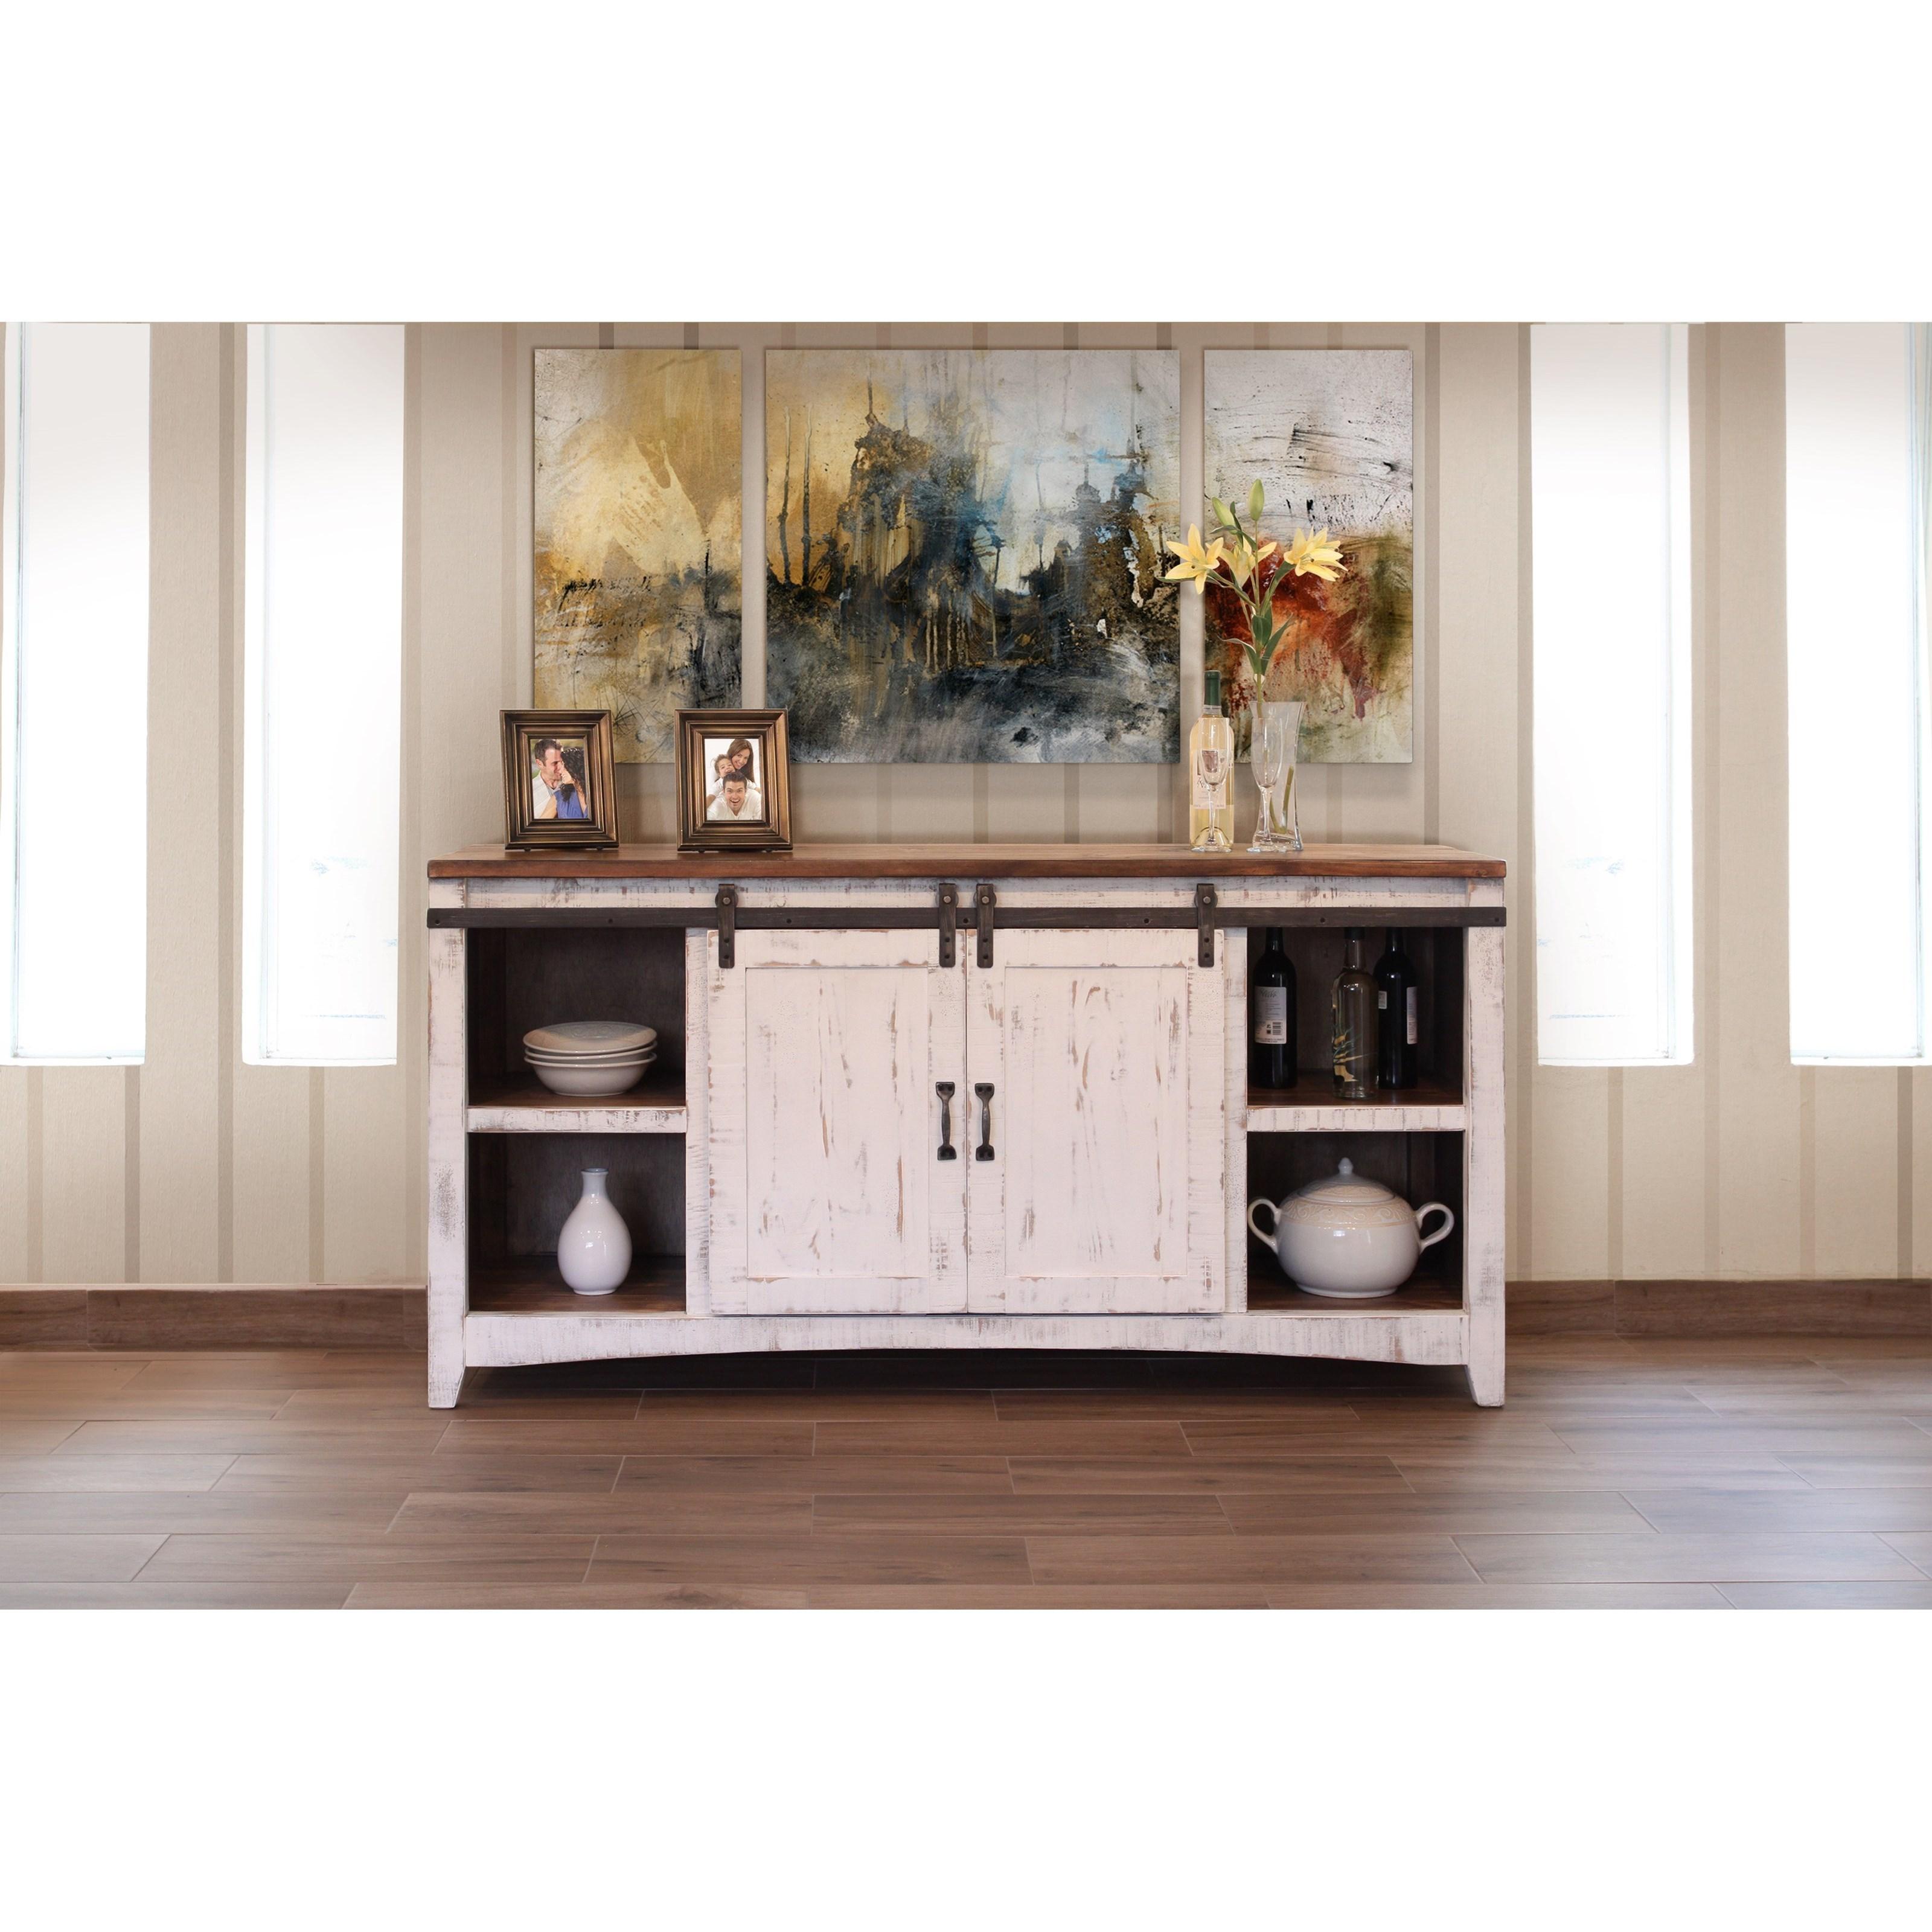 International Furniture Direct Pueblo IFD360CONS Console